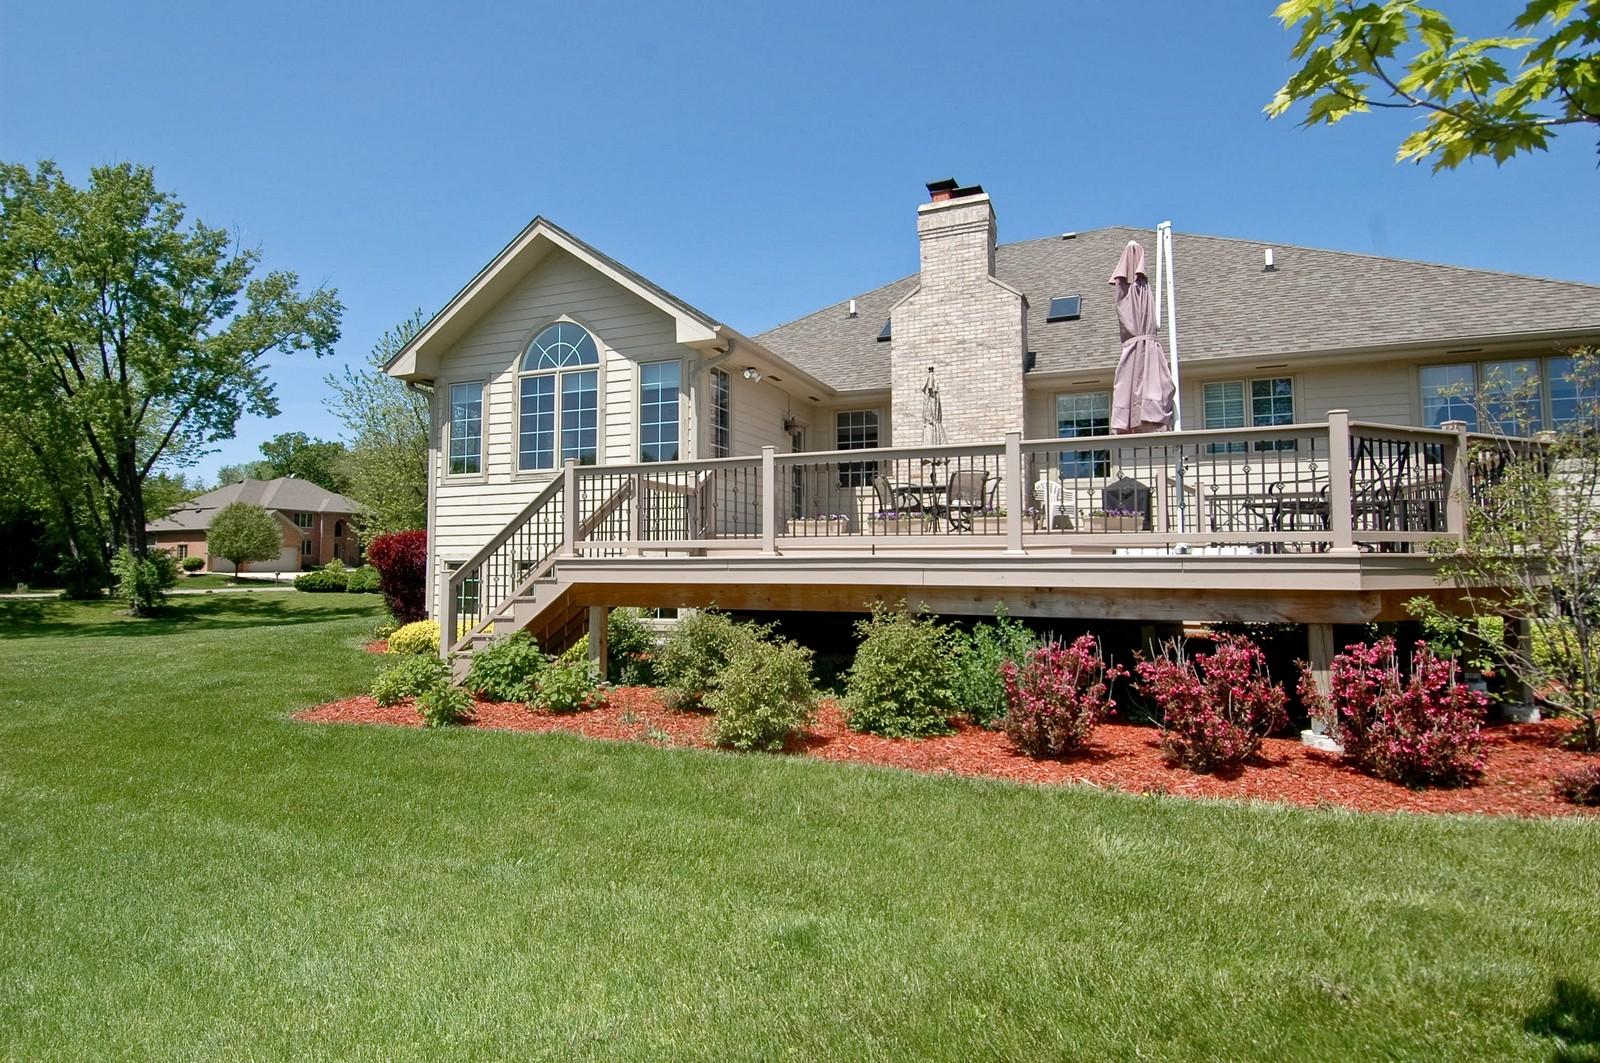 Real Estate Photography - 8719 Shade Tree Circle, Village of Lakewood, IL, 60014 - Rear View